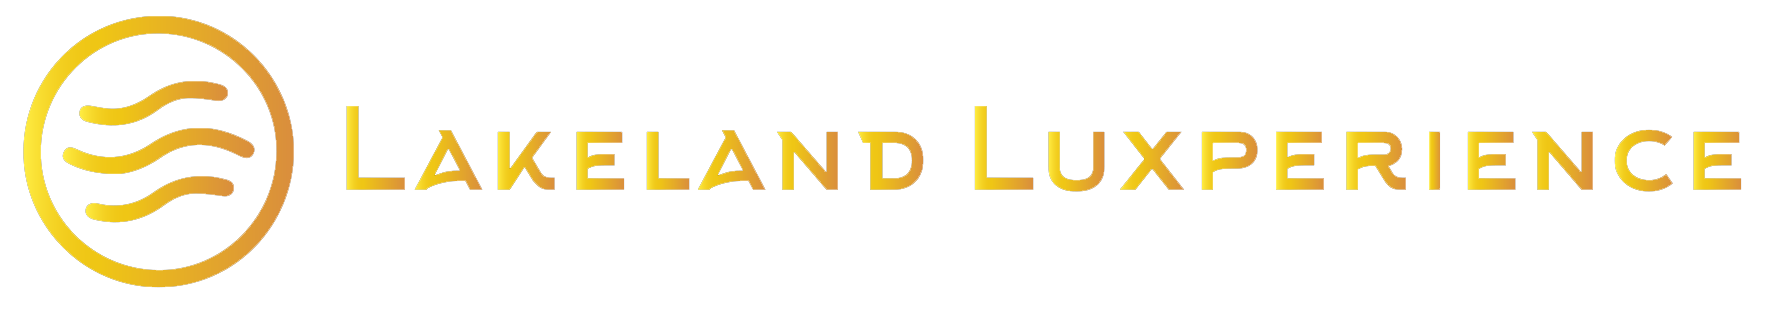 Lakeland Luxperience